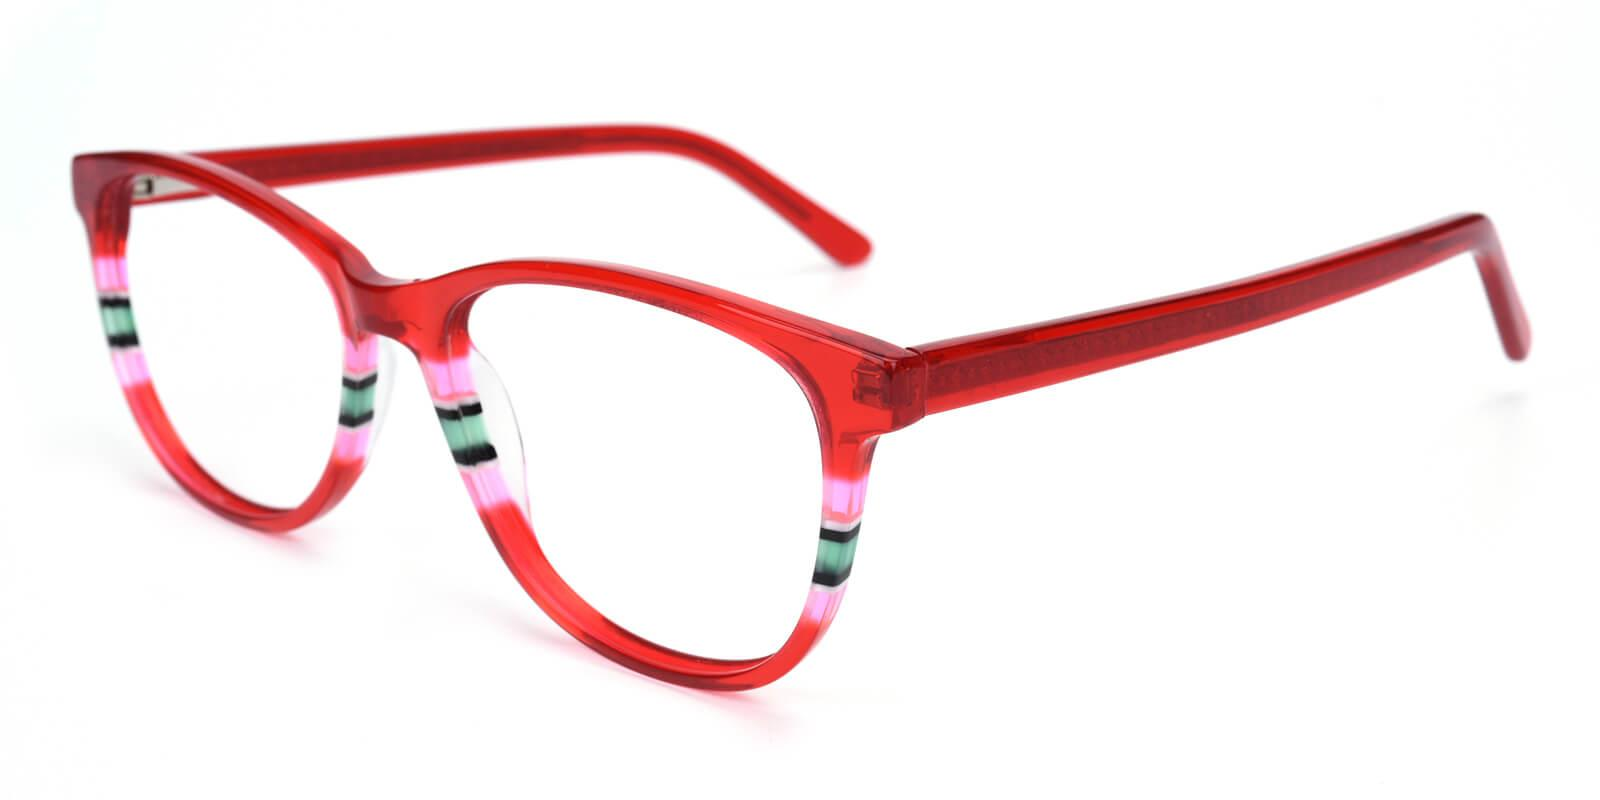 Faithely-Red-Square-Acetate-Eyeglasses-additional1